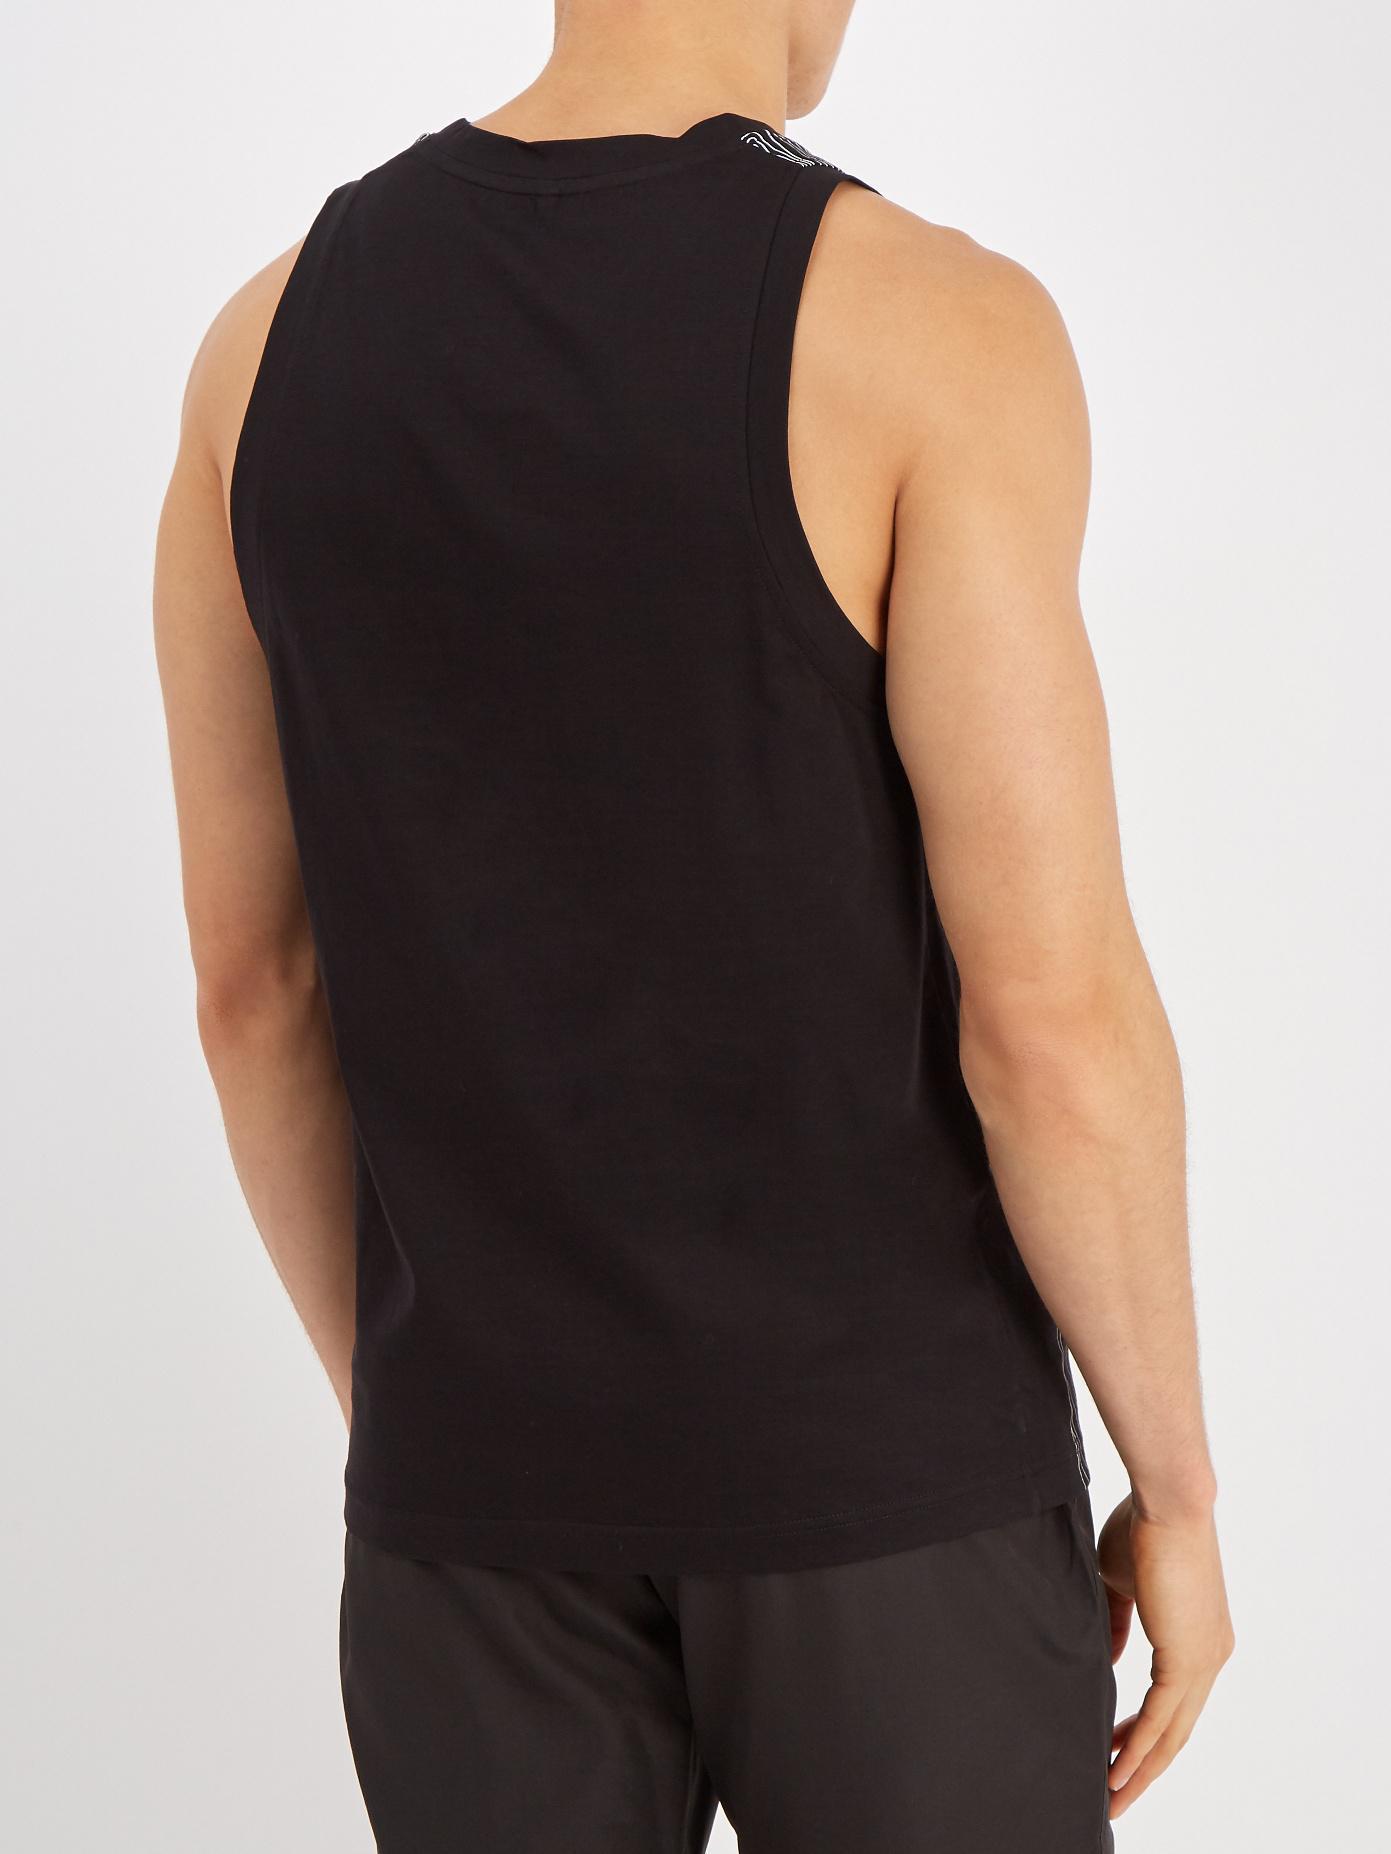 Topography body-print cotton-jersey tank top Blackbarrett by Neil Barrett Cheap Sale 100% Guaranteed sweCit